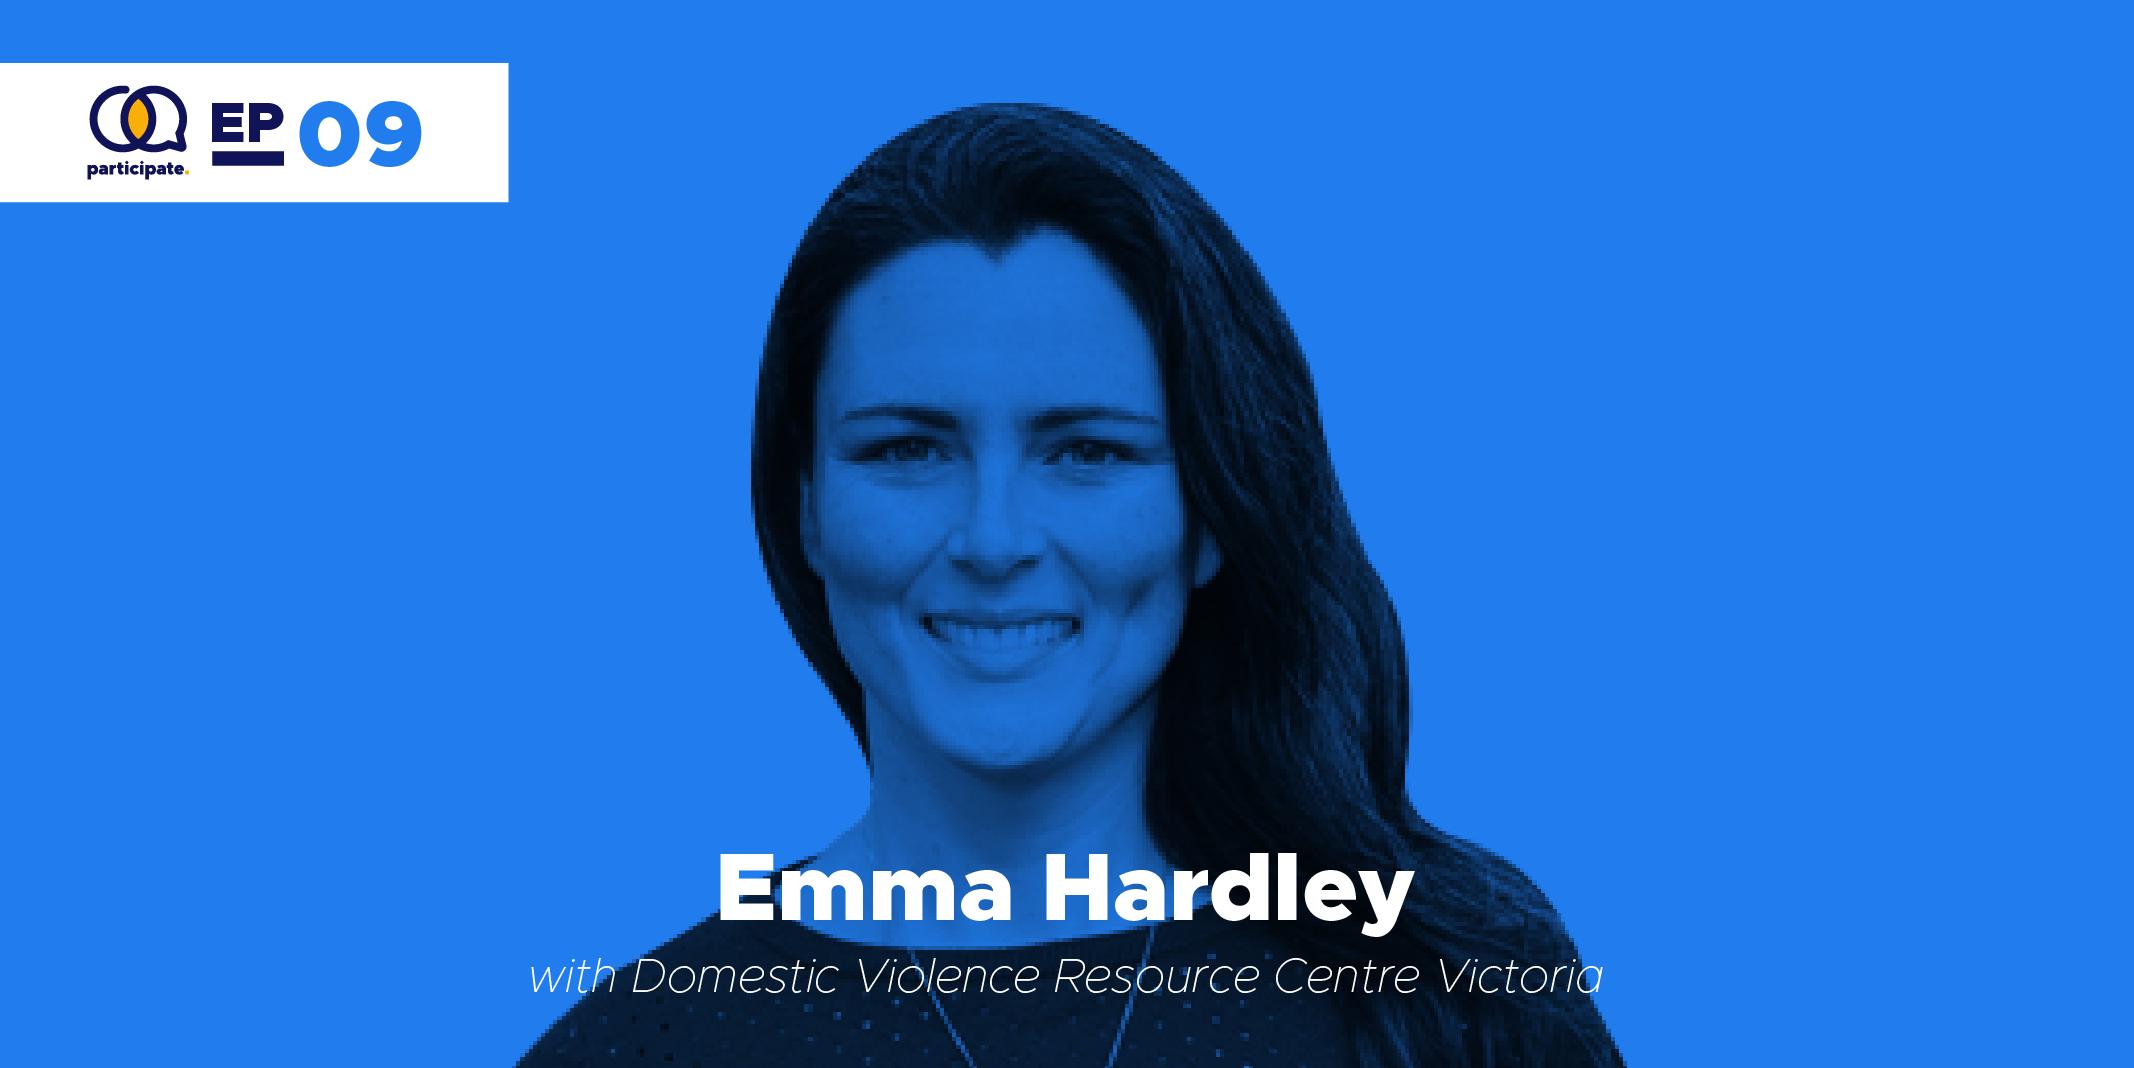 Emma Hardley with Domestic Violence Resource Centre Victoria